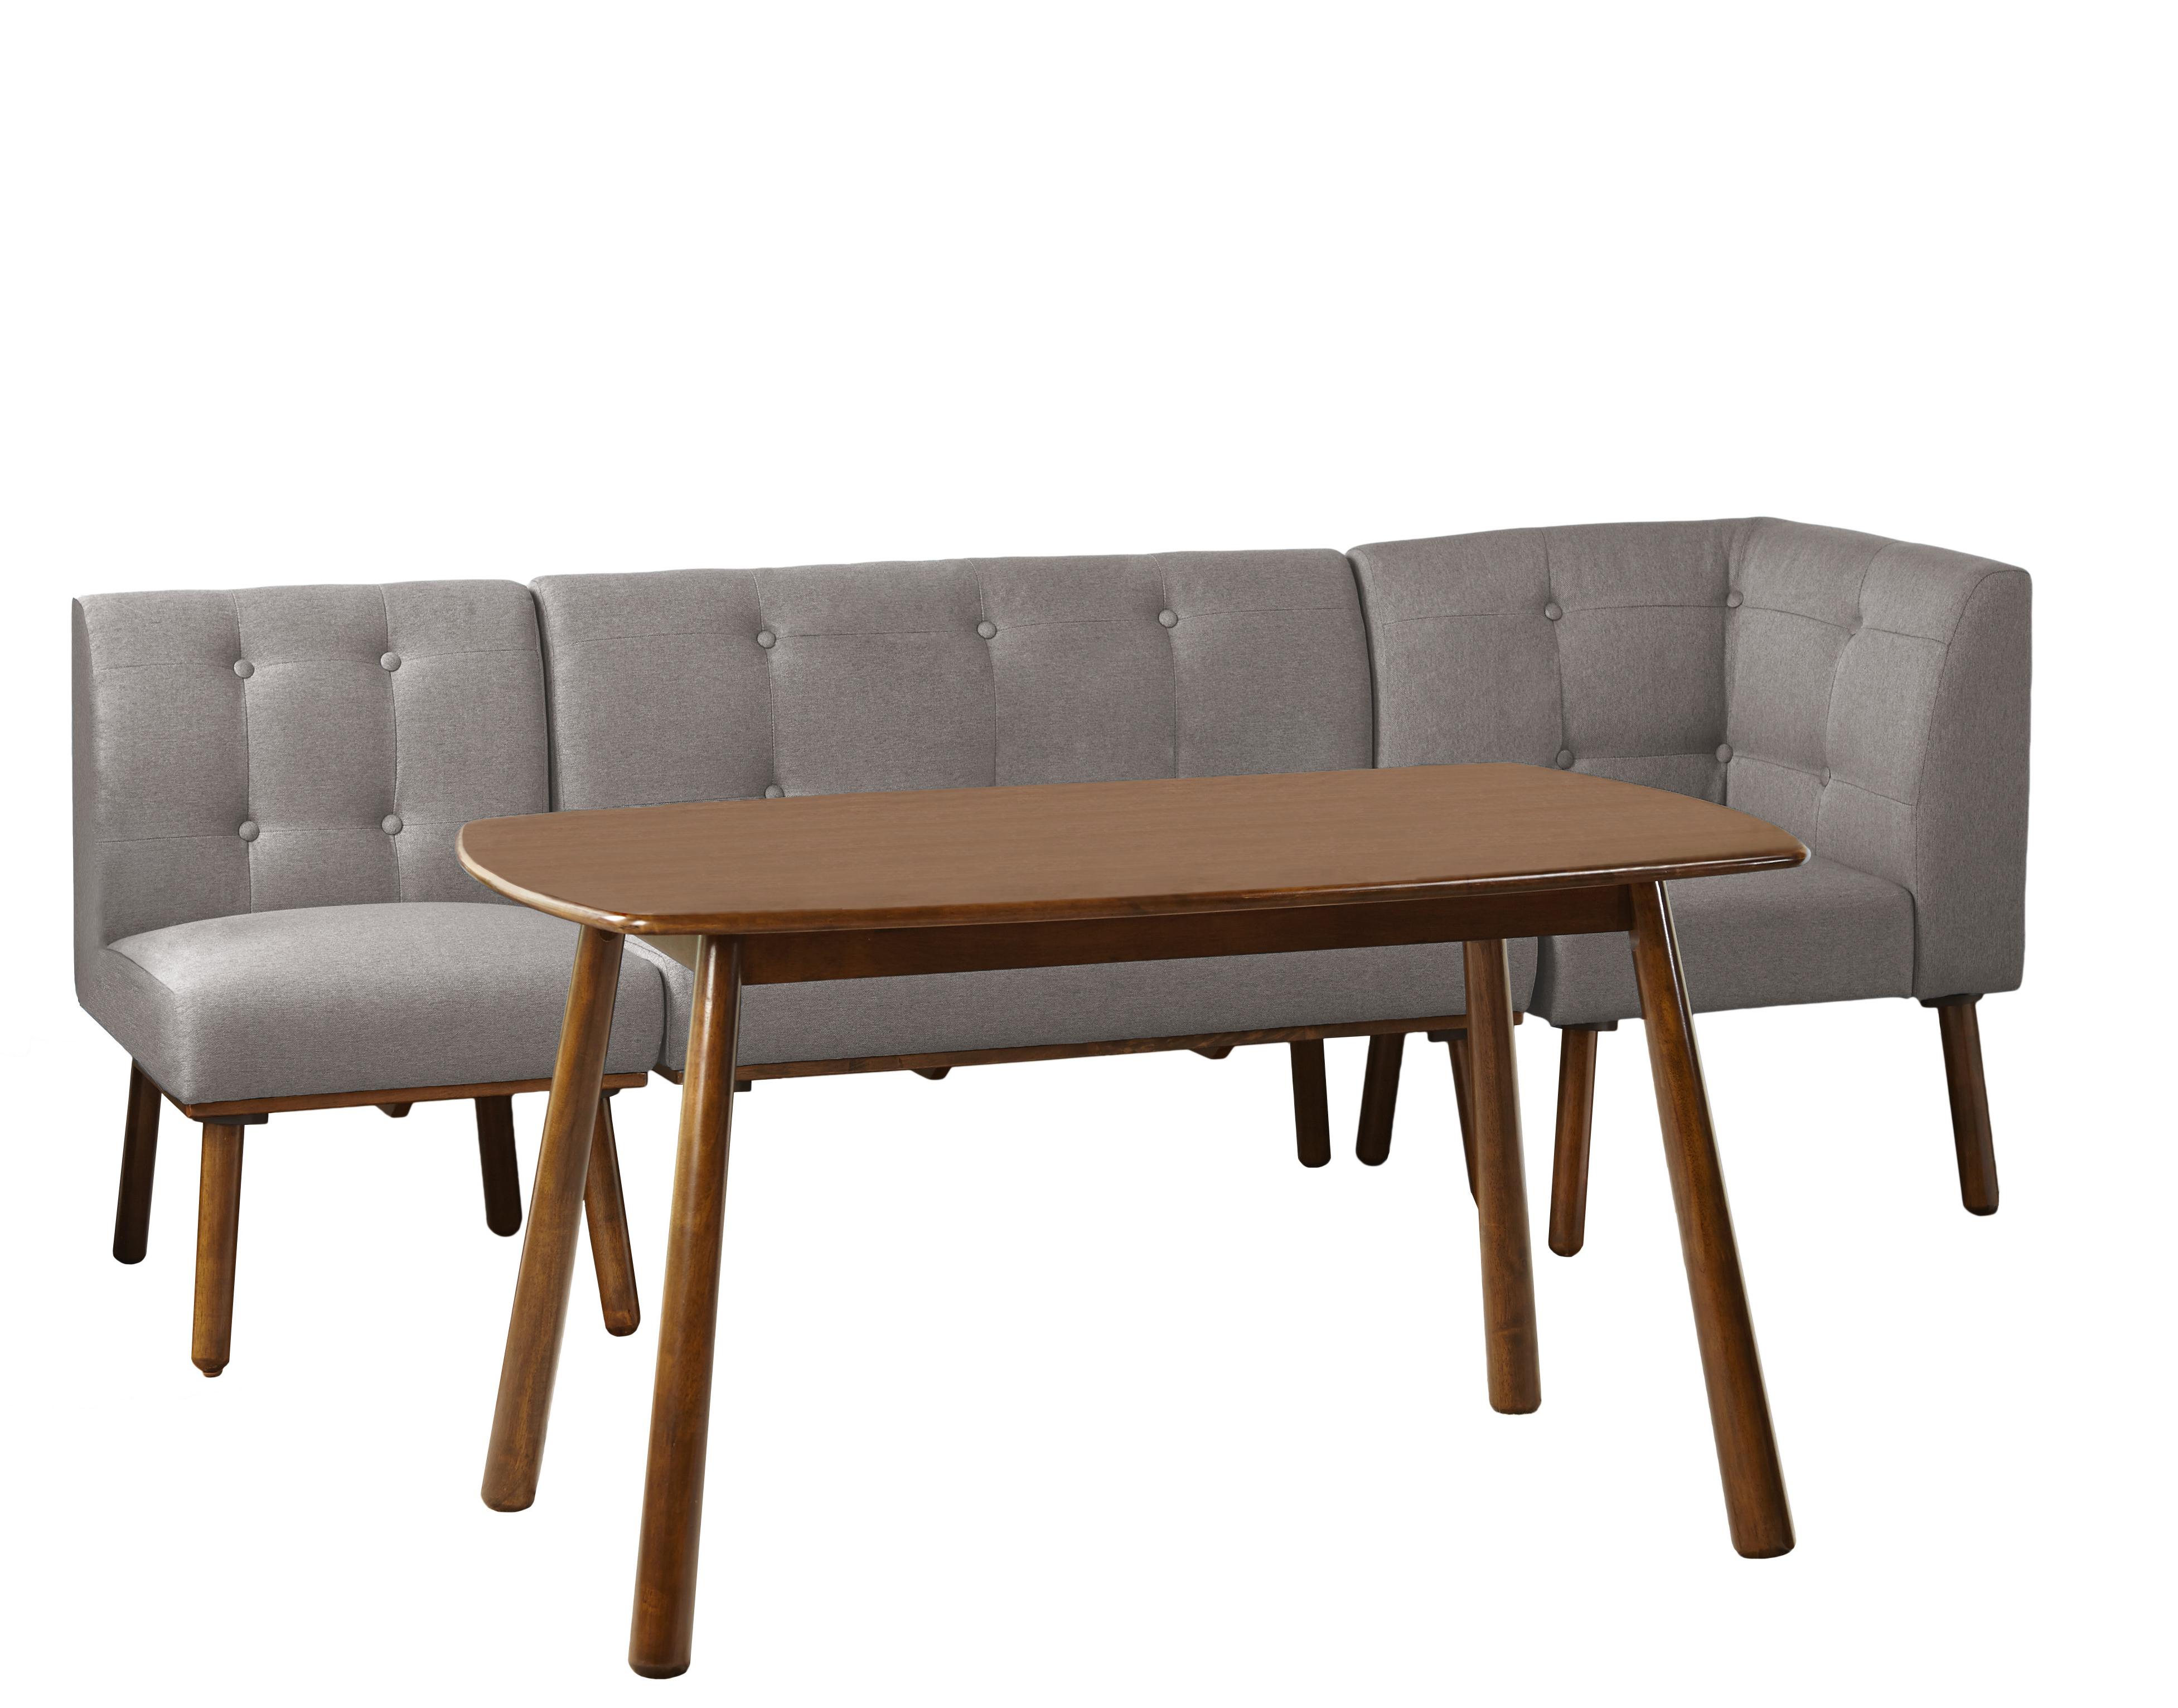 Most Popular Lillard 3 Piece Breakfast Nook Dining Sets For Modern Rustic Interiors Bucci 4 Piece Breakfast Nook Dining Set (View 12 of 20)